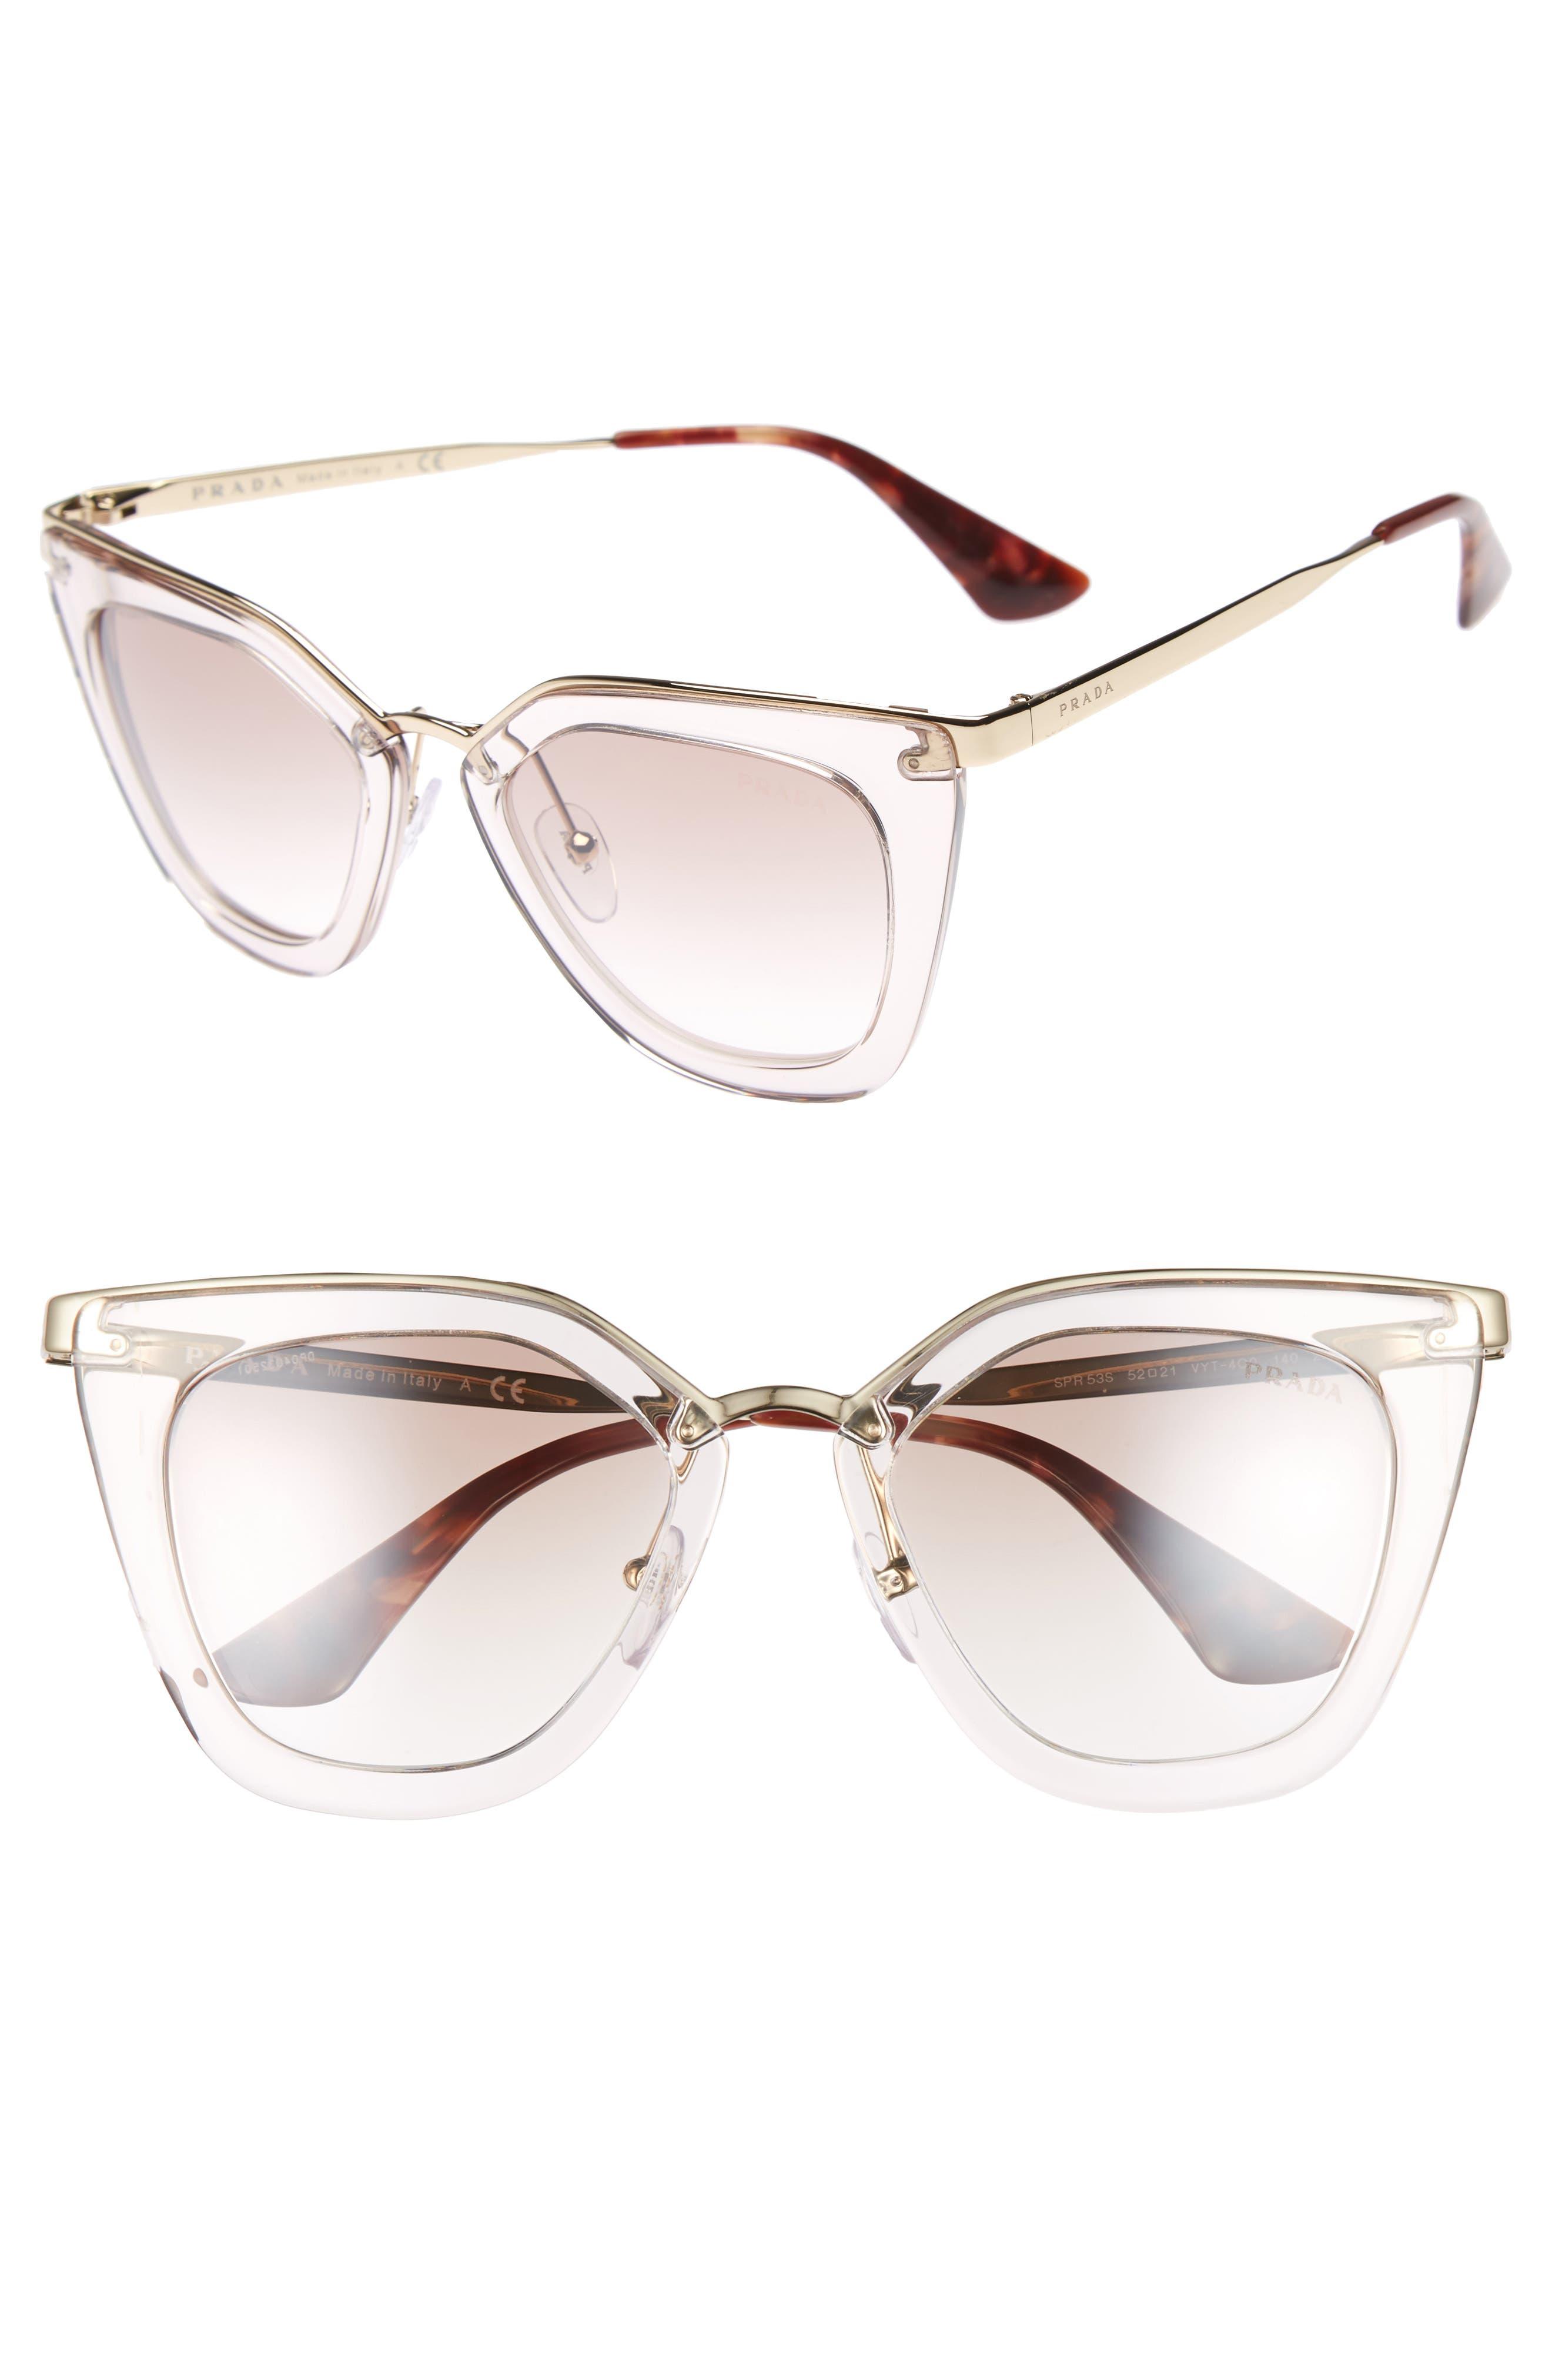 52mm Retro Sunglasses,                             Alternate thumbnail 2, color,                             200